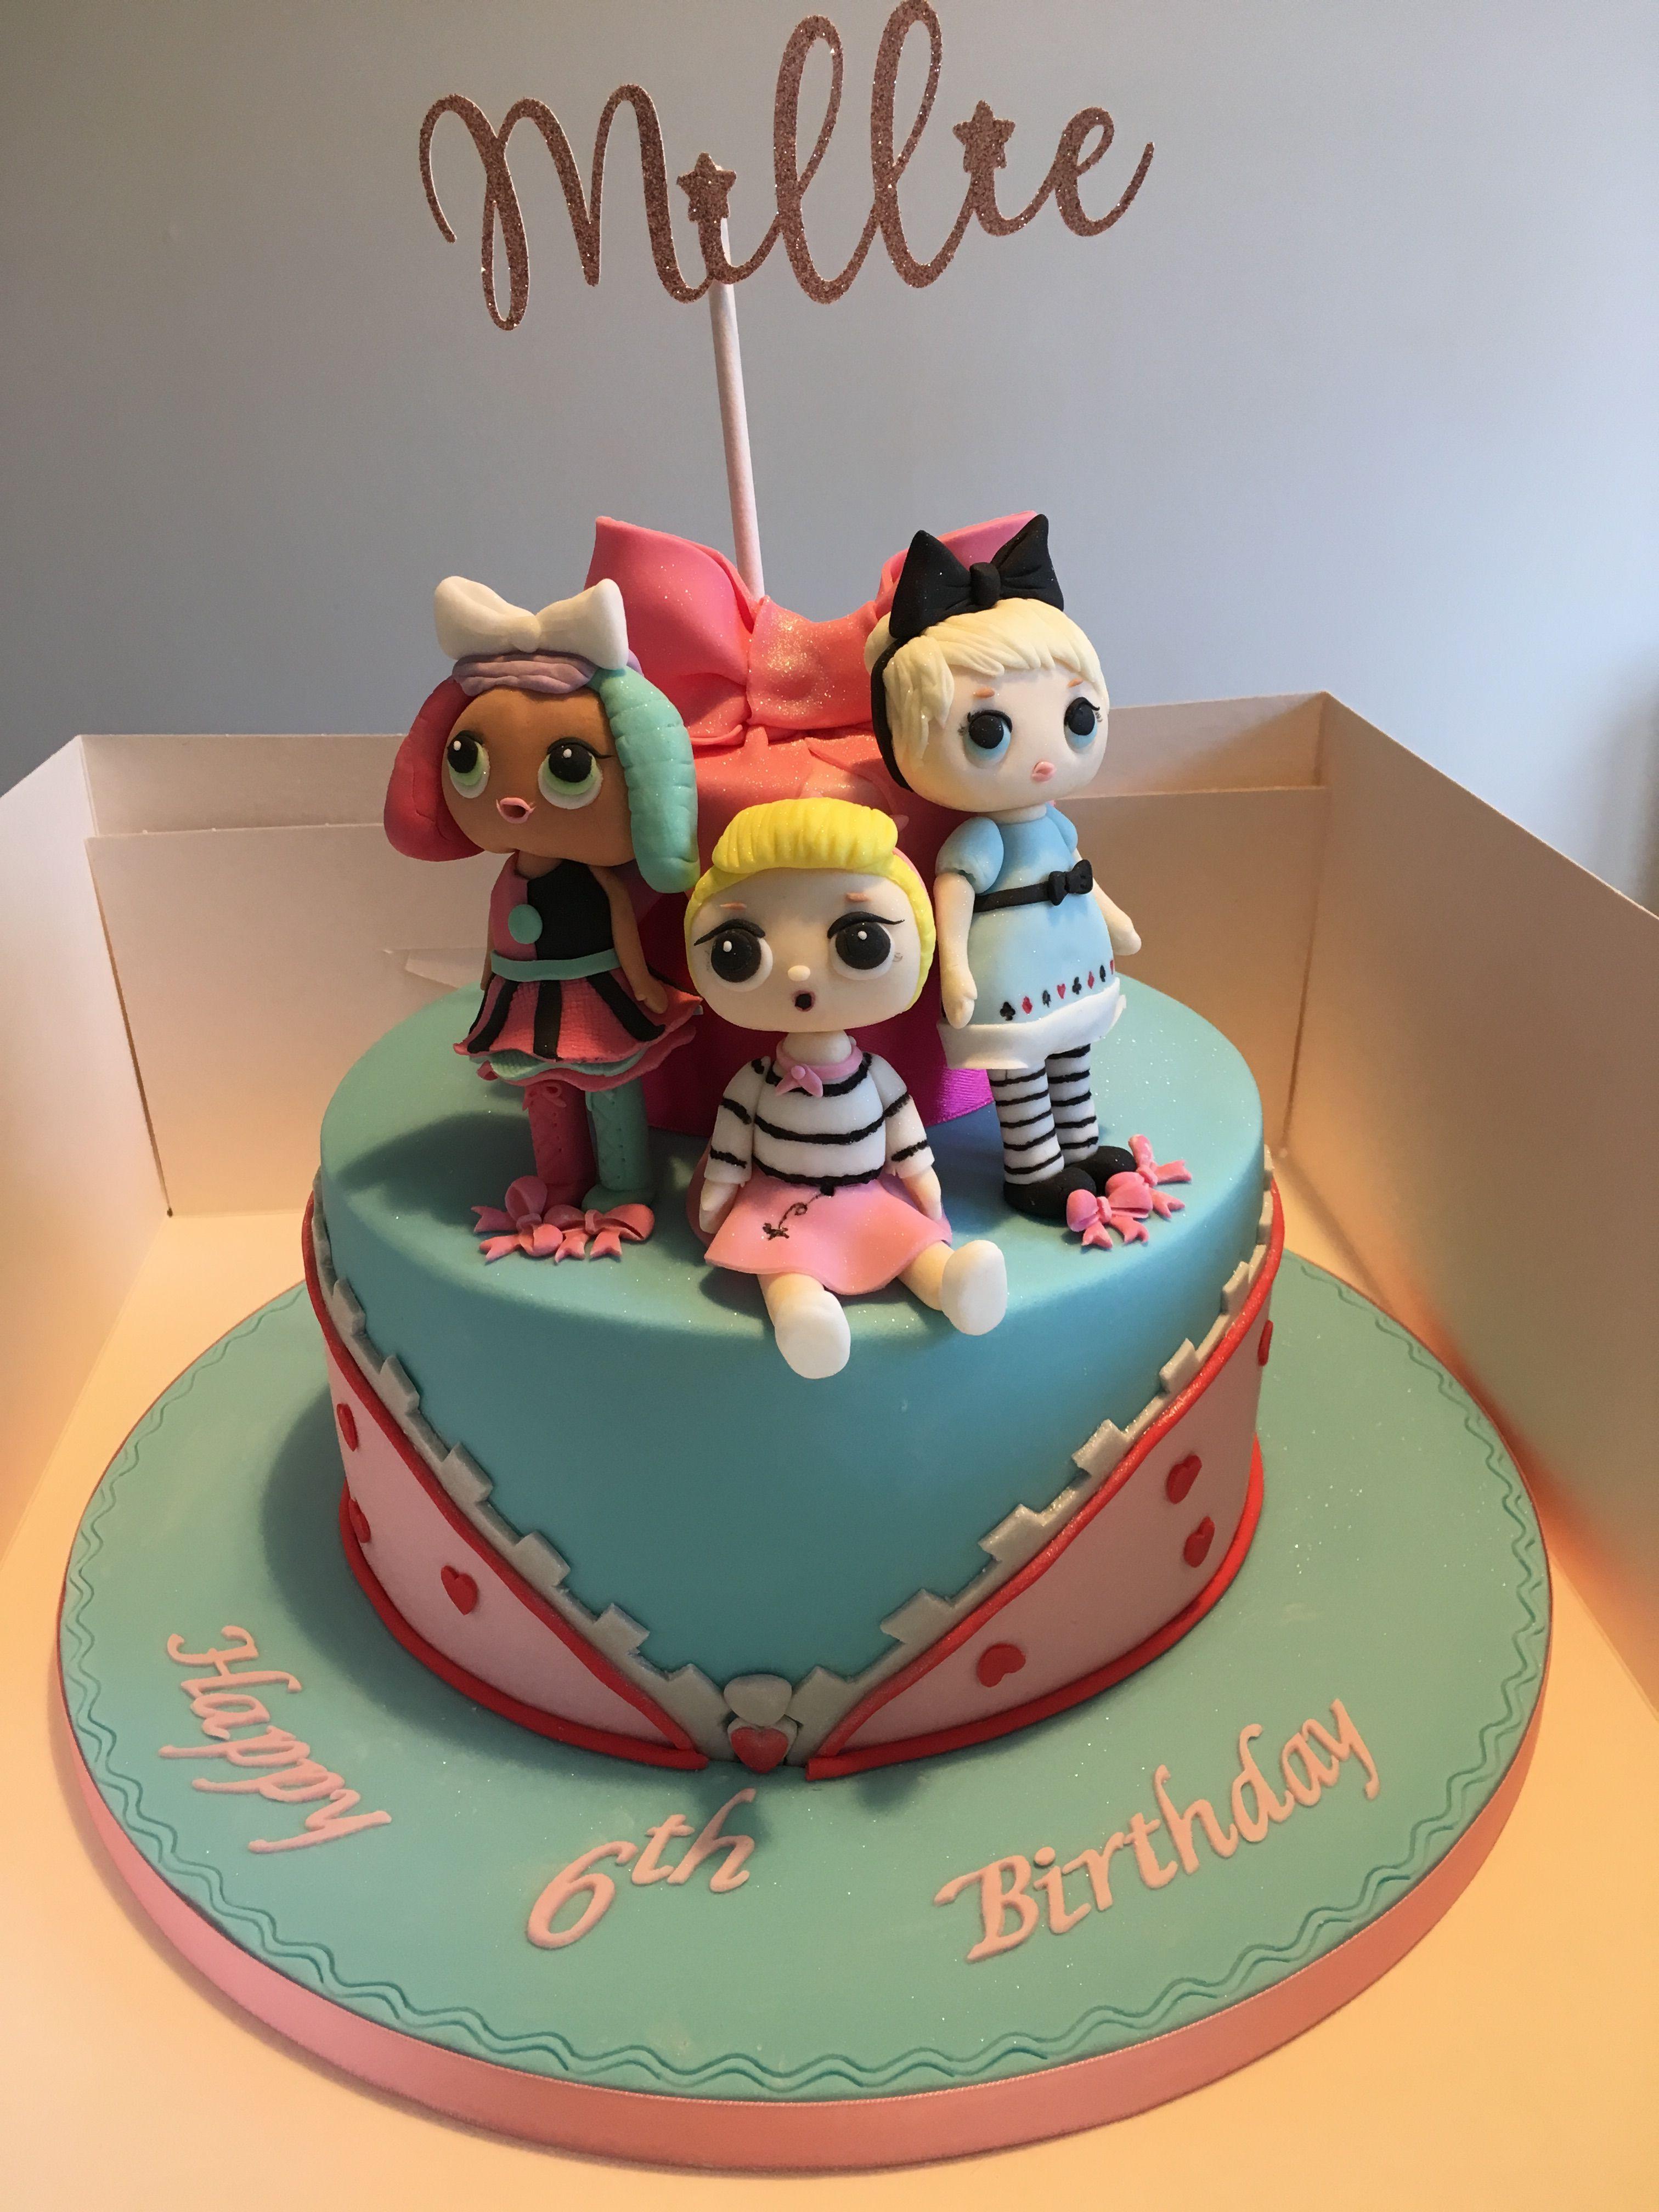 Lol doll birthday cake lol doll cake doll birthday cake